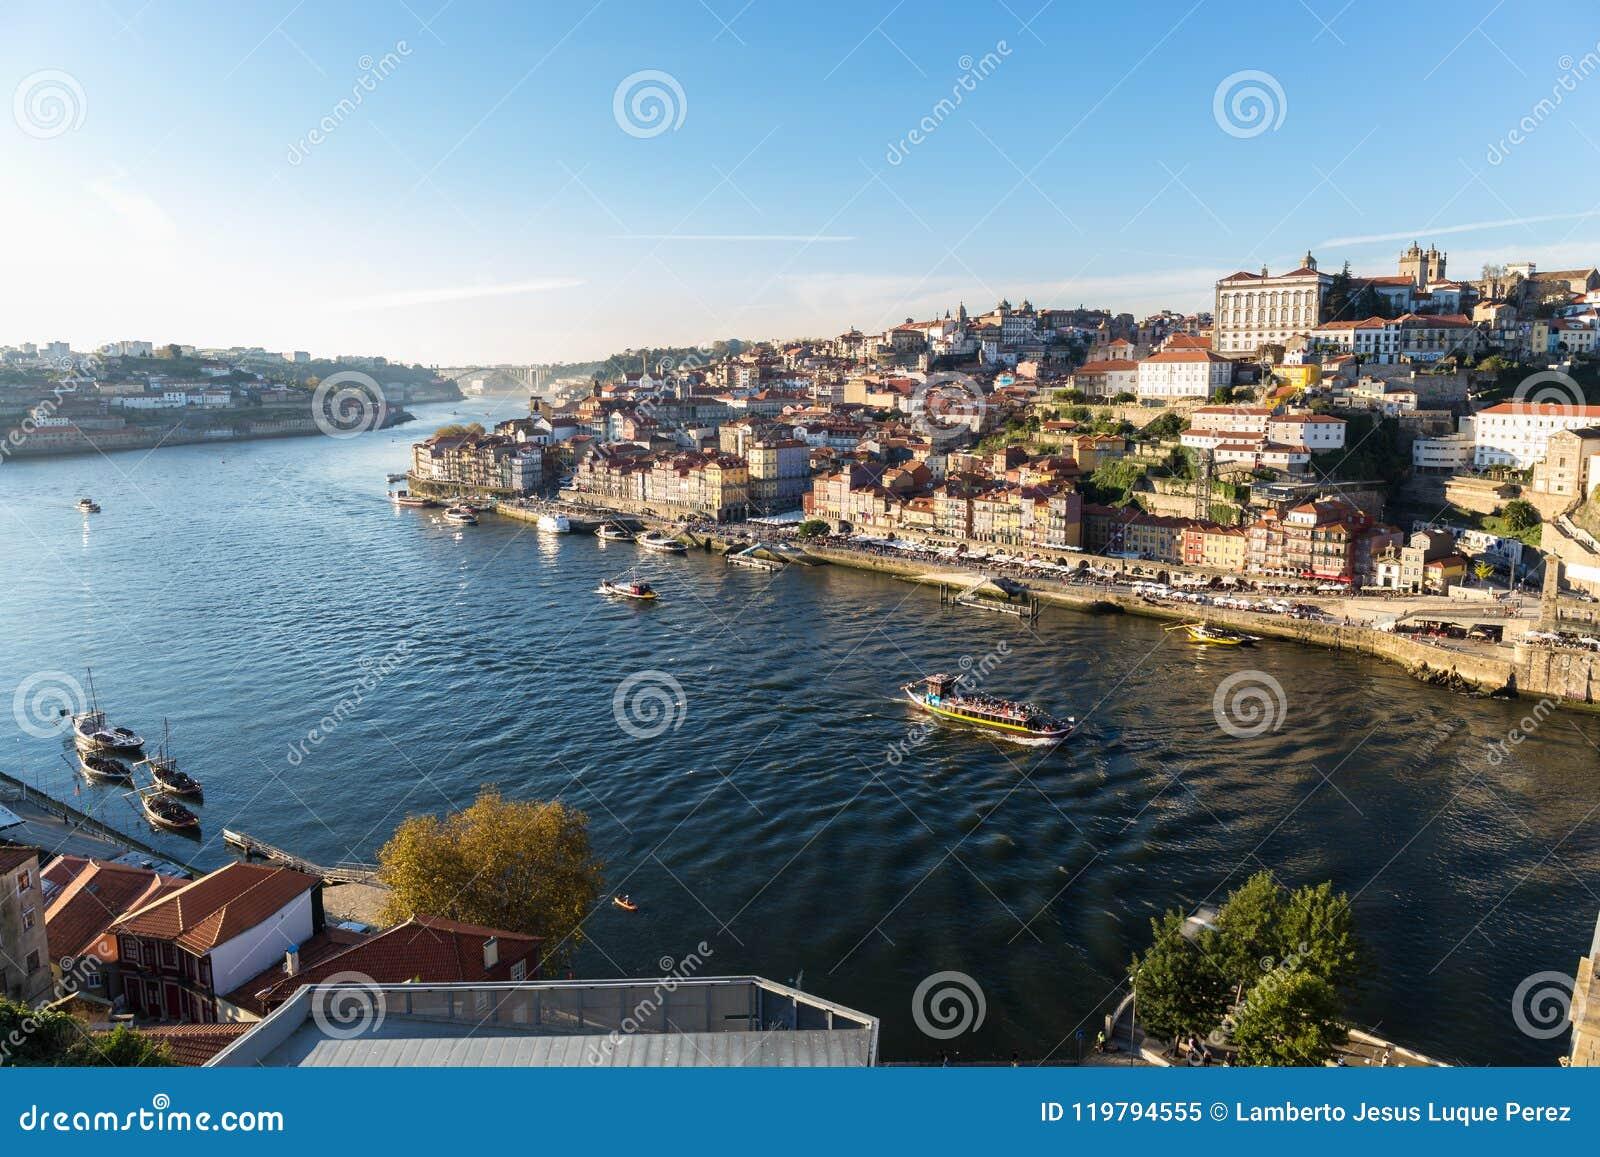 View of Porto and the Douro River